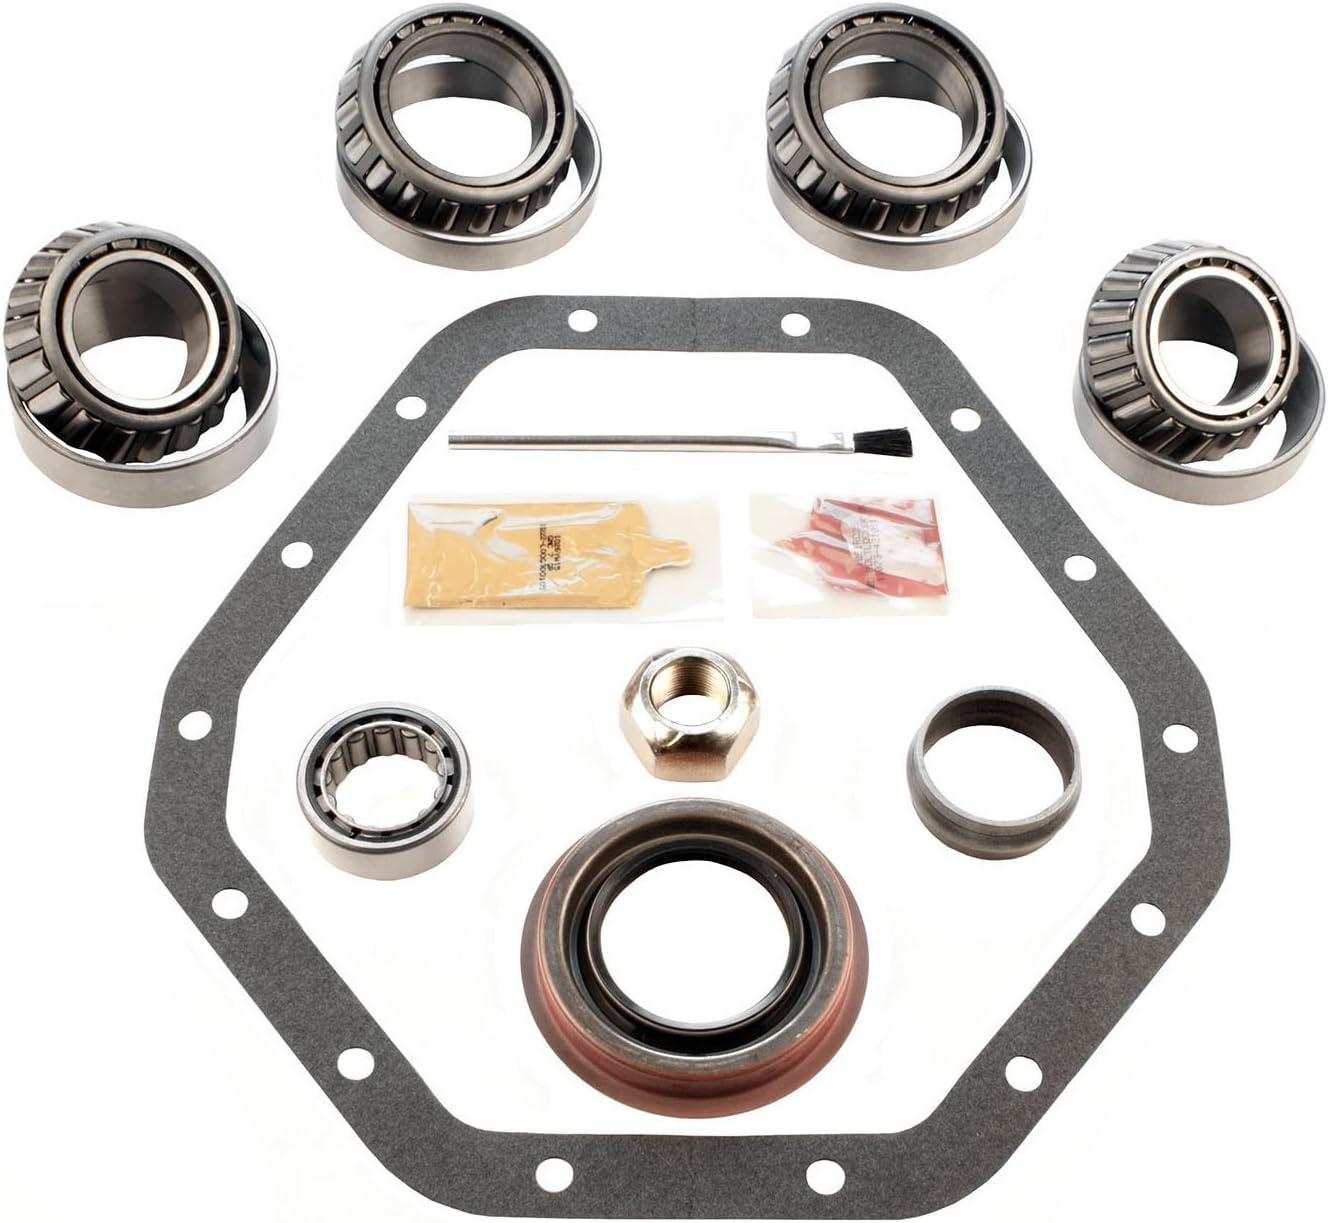 GM 8.25 IFS 98-ON Motive Gear R8.2RIFSL Bearing Kit with Koyo Bearings